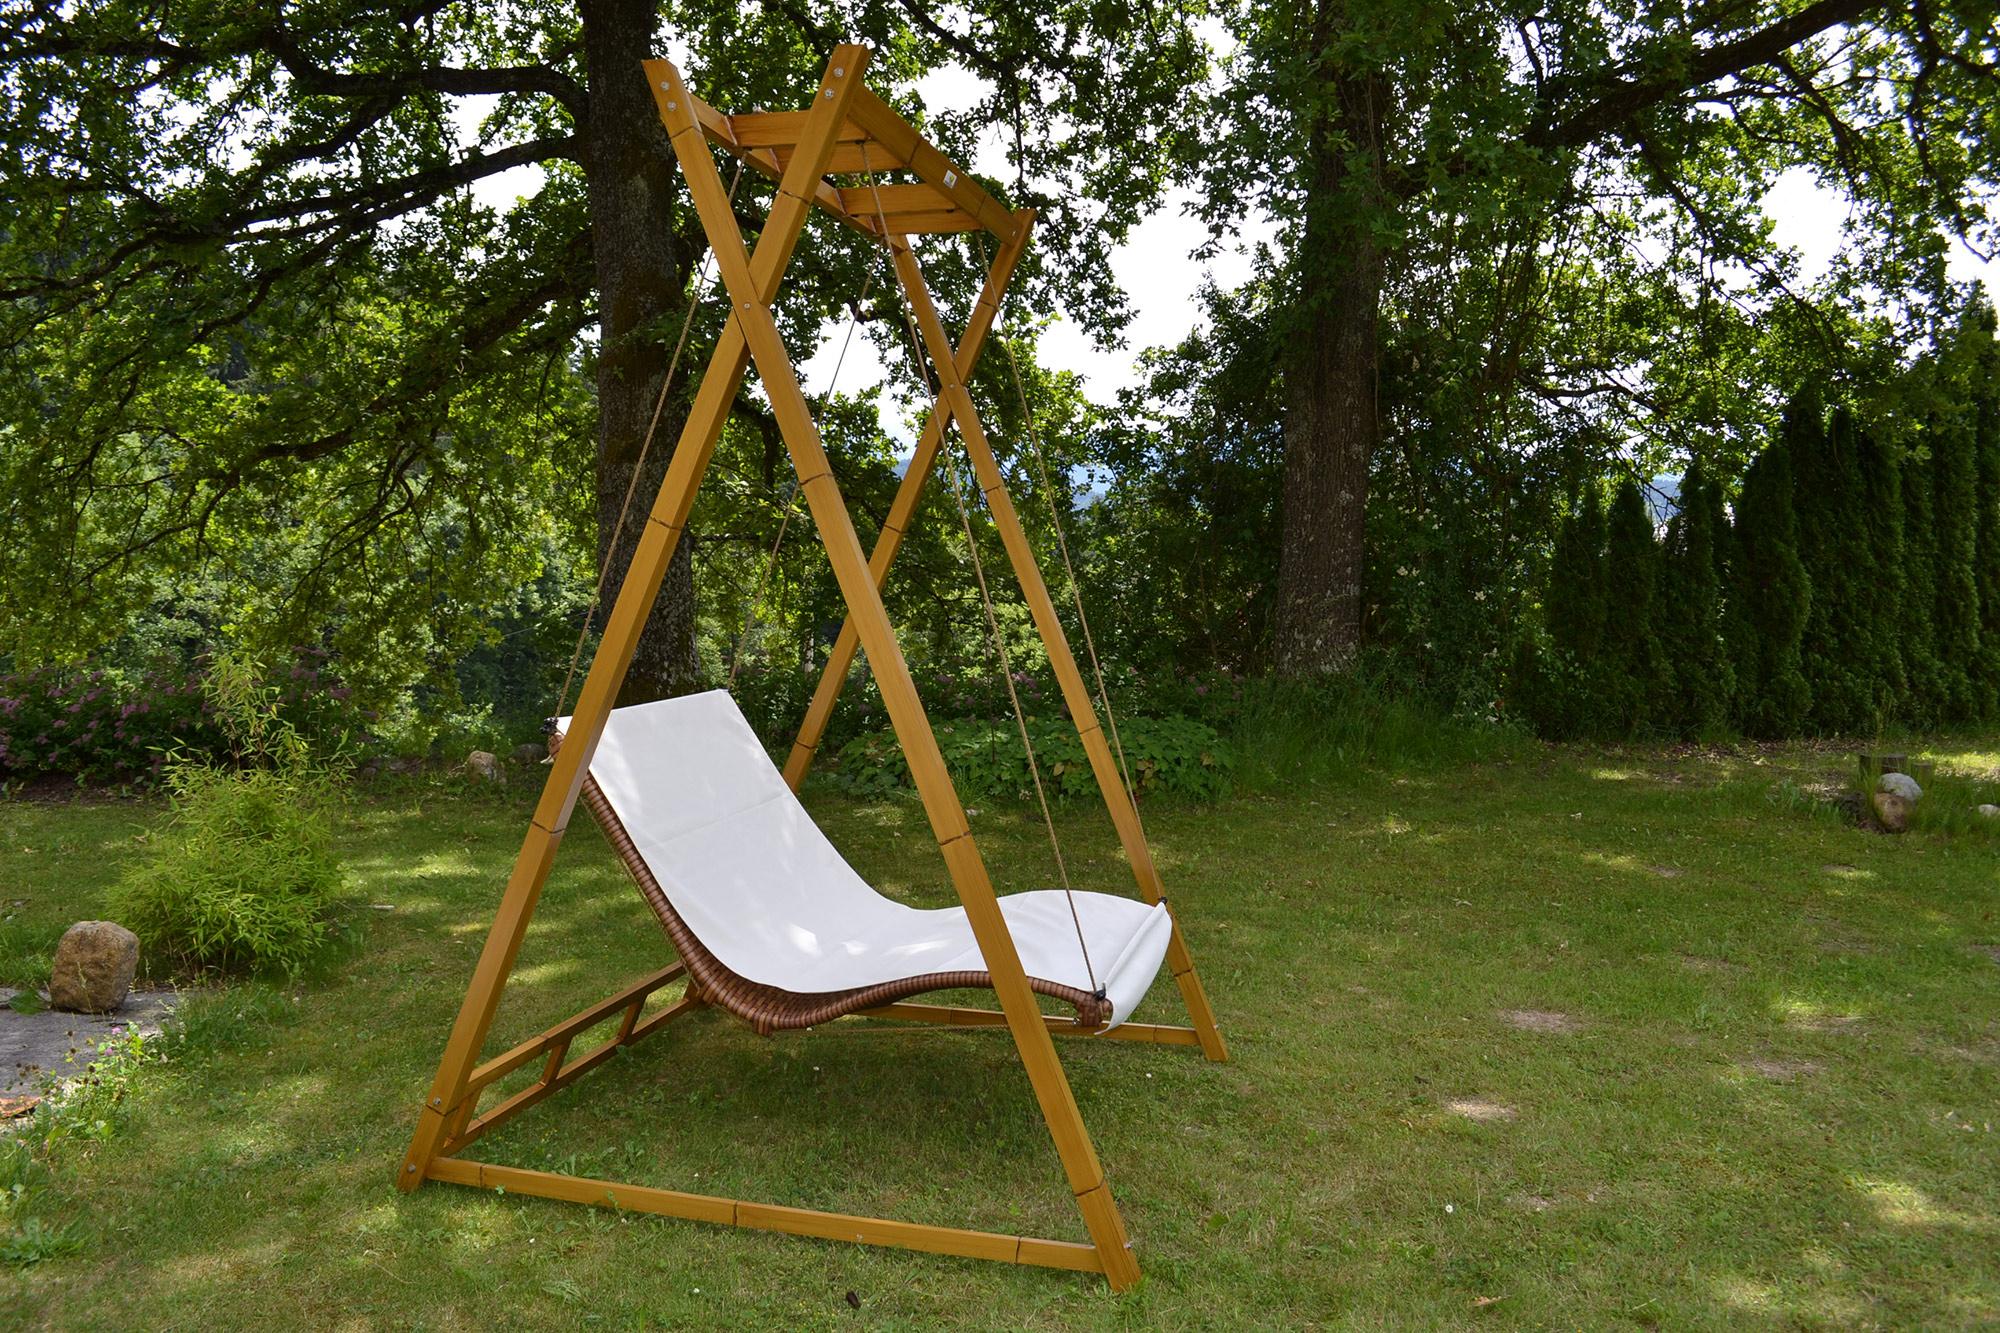 doppelliege sonnendach. Black Bedroom Furniture Sets. Home Design Ideas